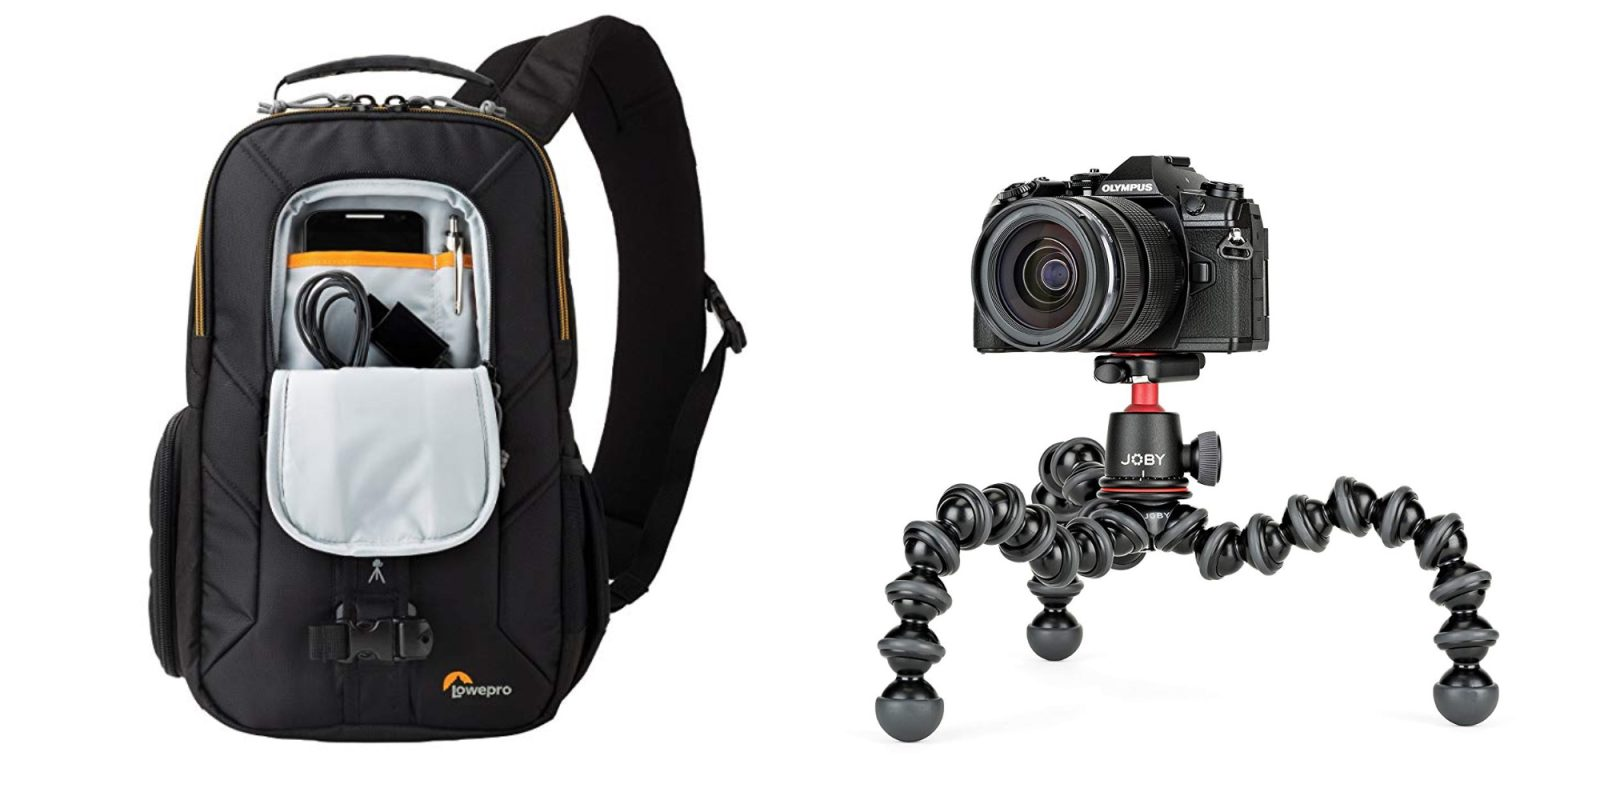 Bundle Lowepro's Slingshot Camera Bag and JOBY GorillaPod for $80 ($125 value)